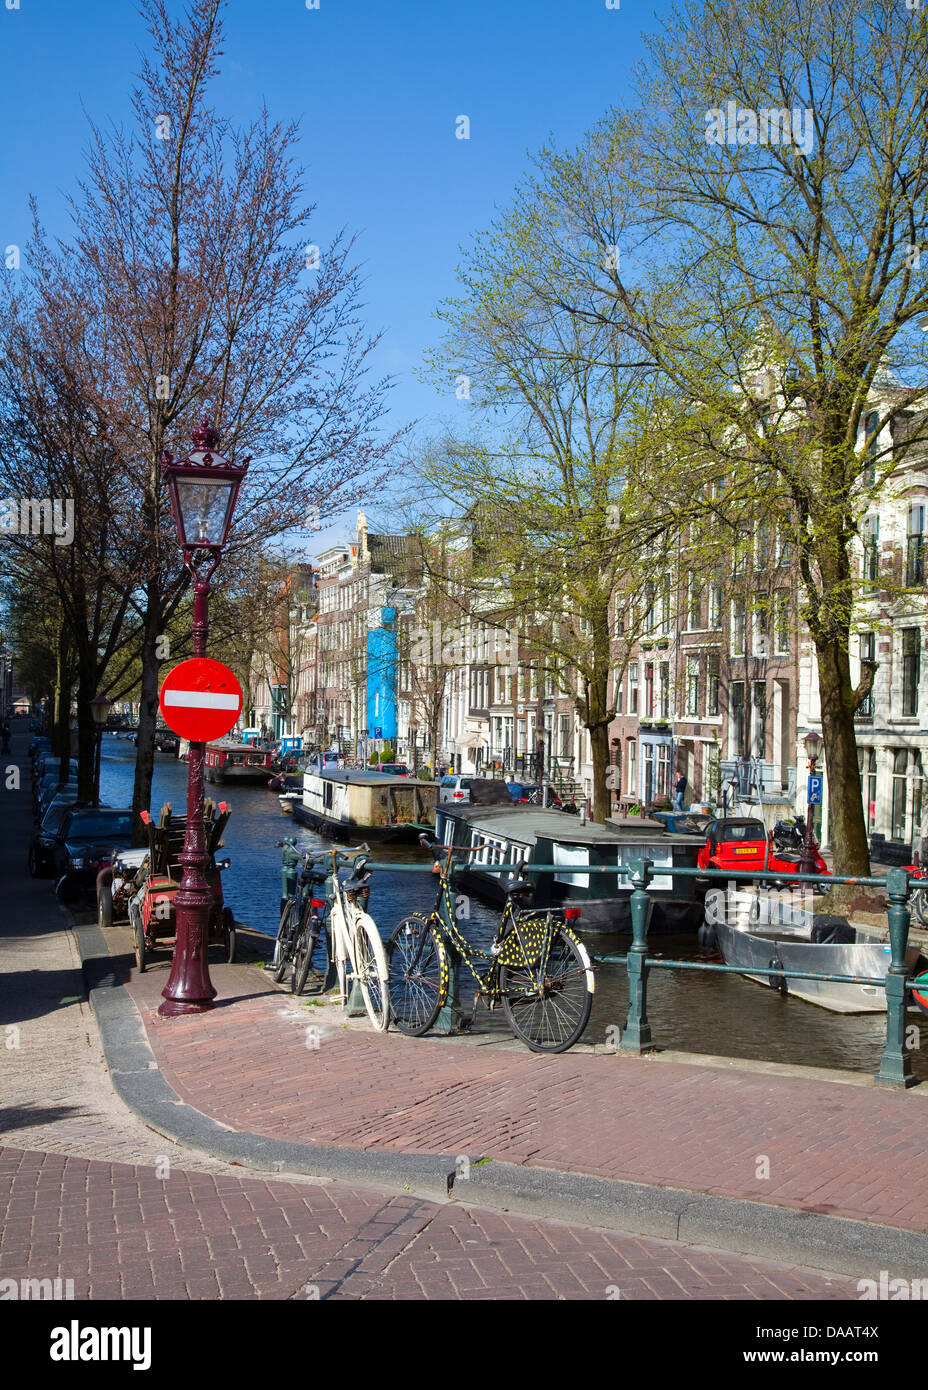 Europe,Netherlands,North Holland,Amsterdam,Jordaan,Prinsengracht - Stock Image